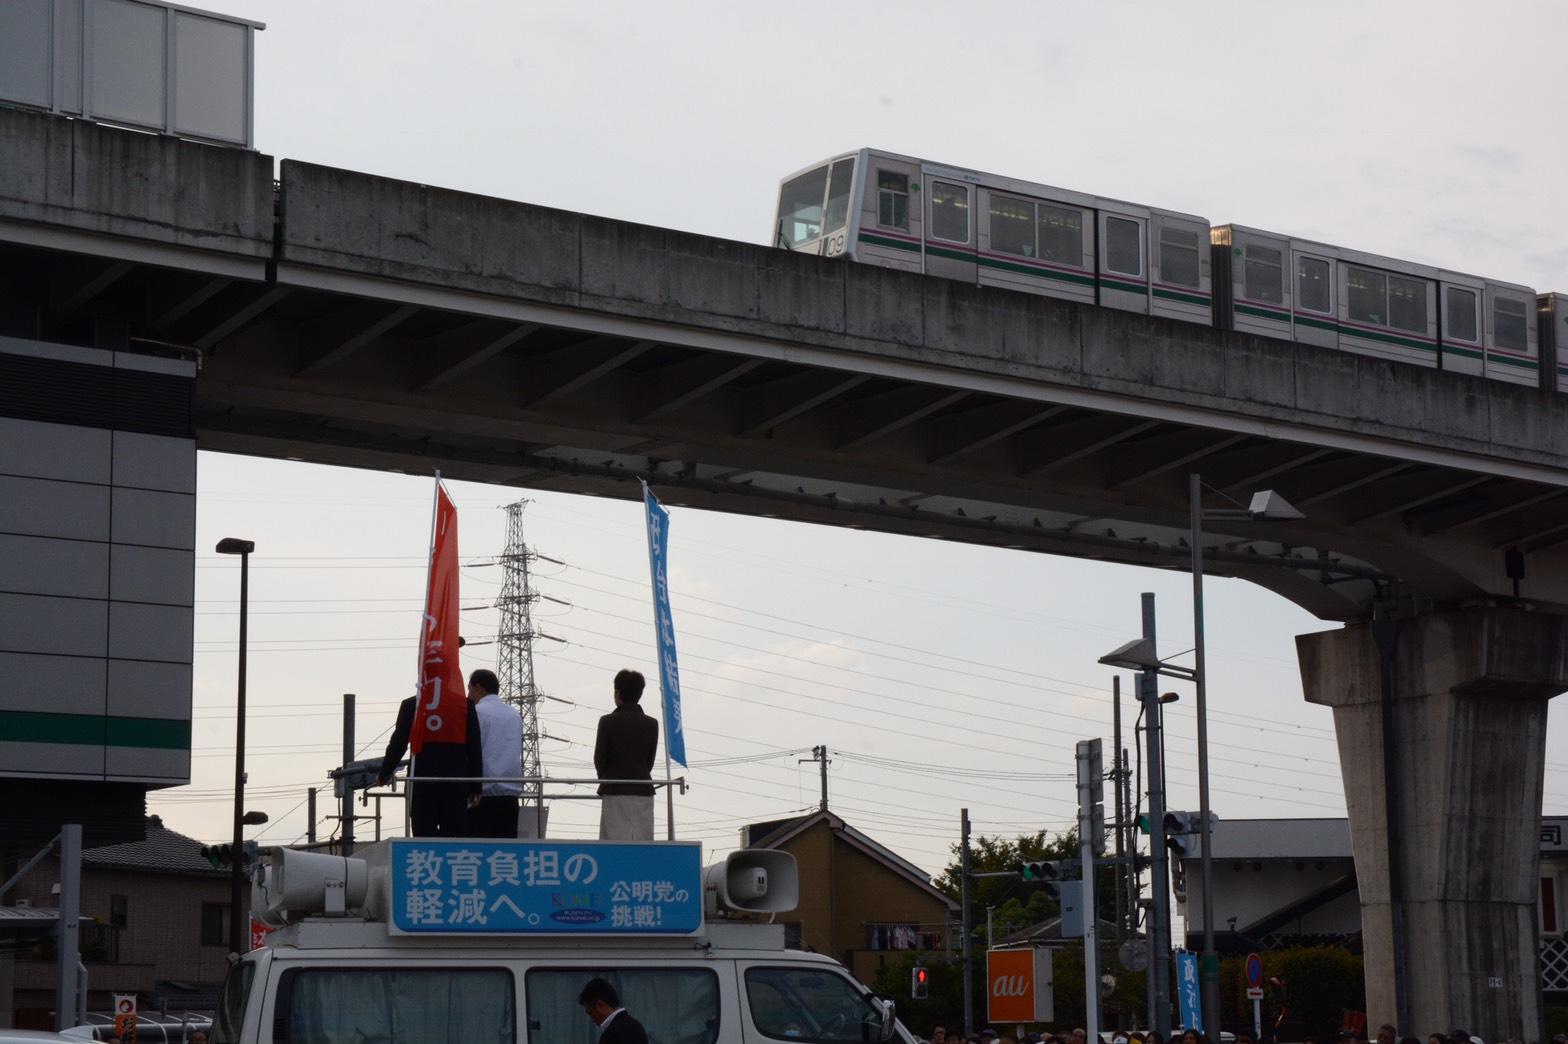 https://www.akihiro-ohta.com/blog/S__9732125.jpg